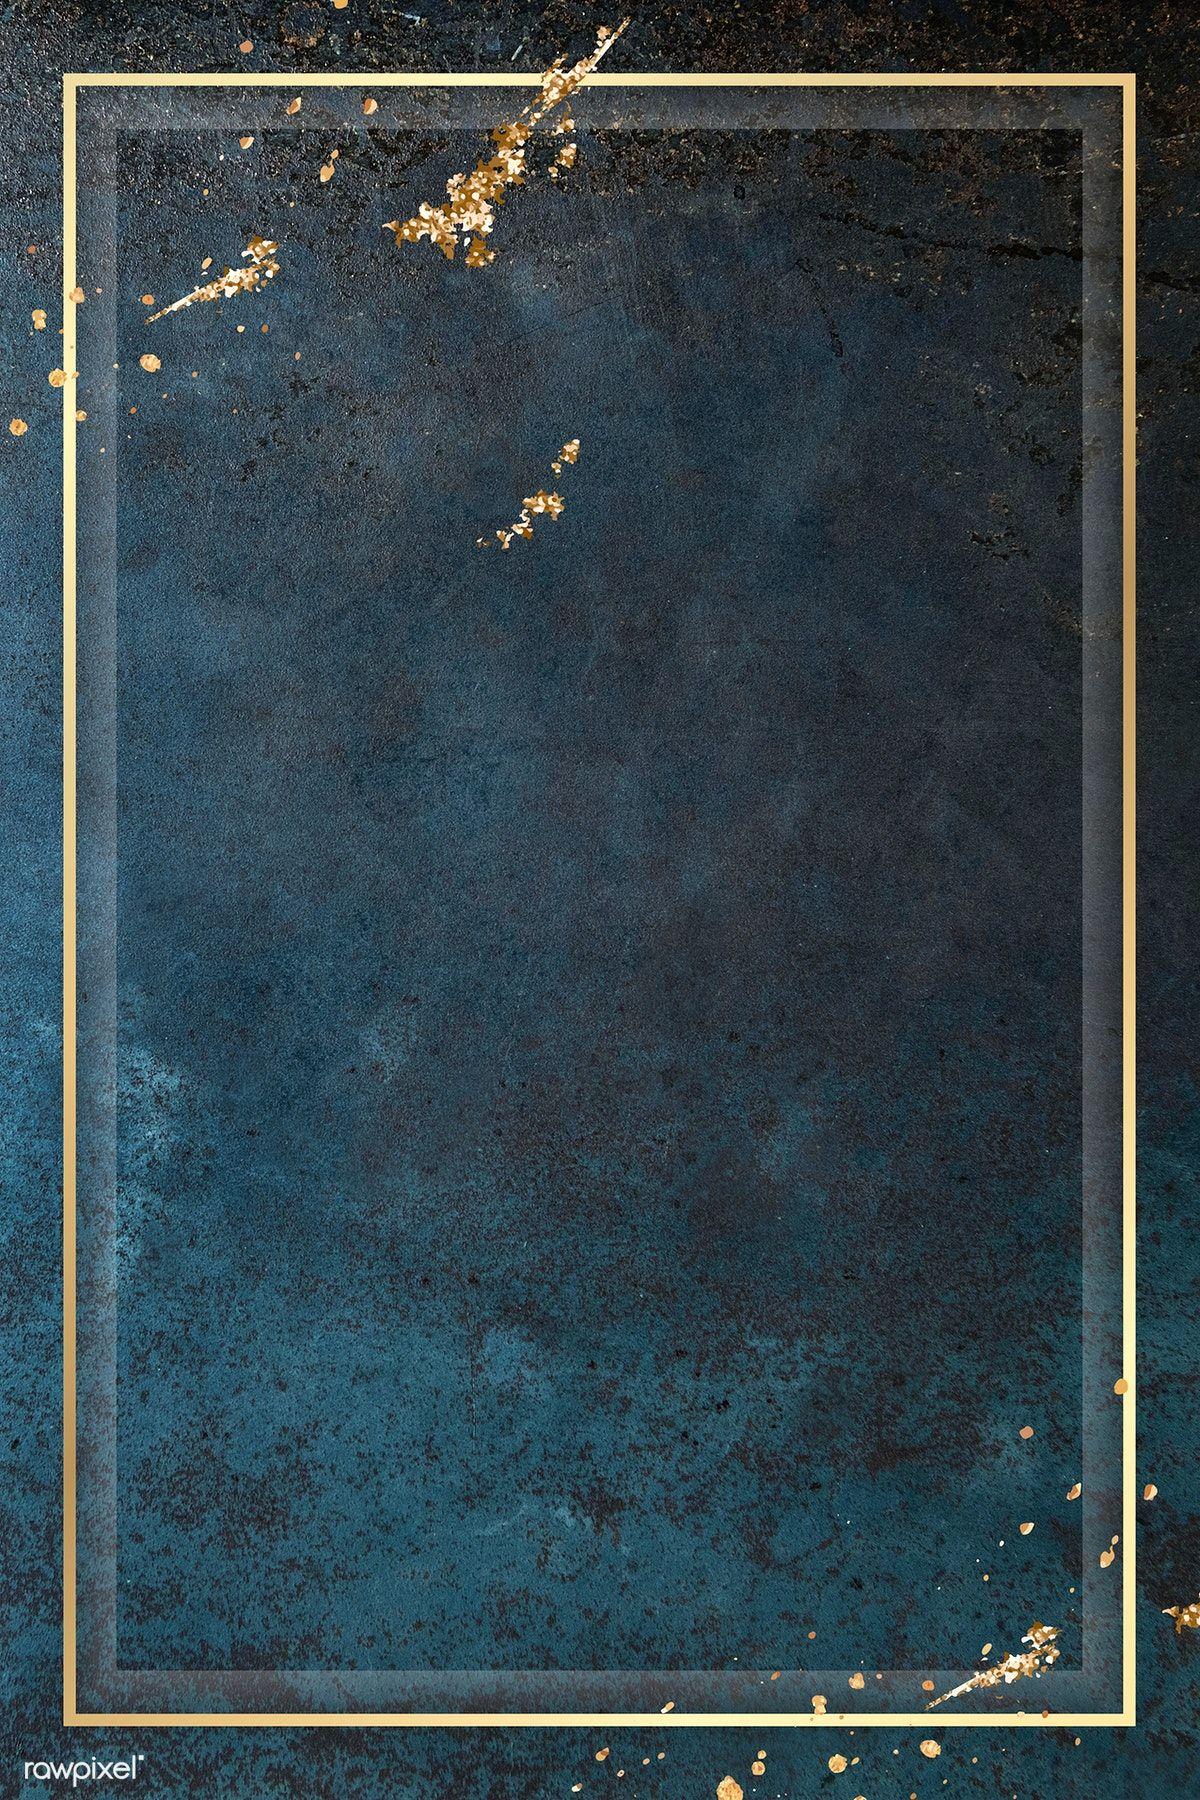 Download premium psd of Blue plain granite background